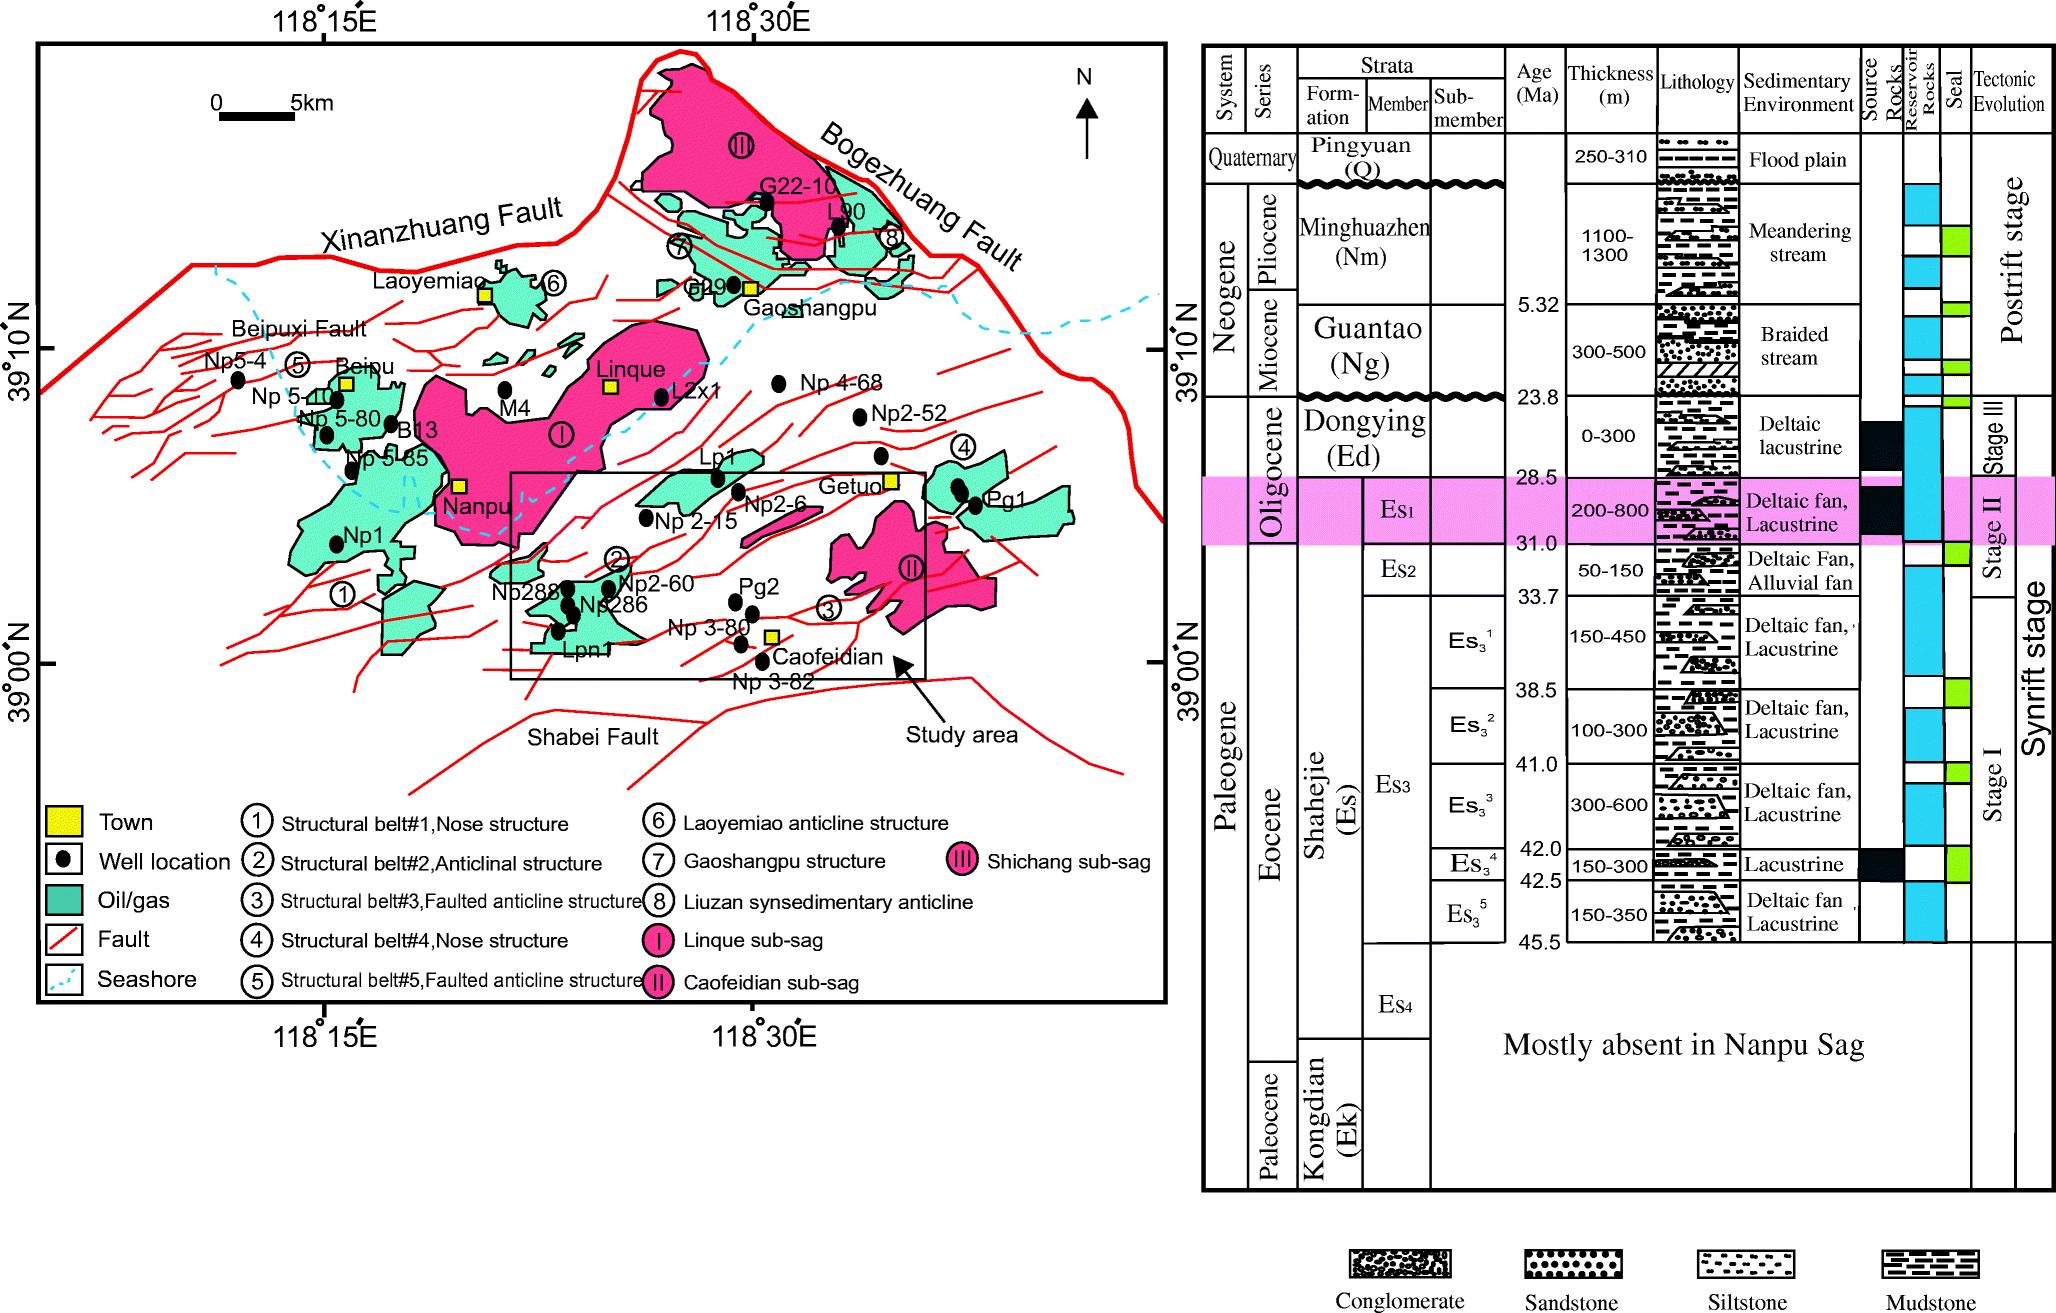 Sedimentological impact on reservoir quality of Es1